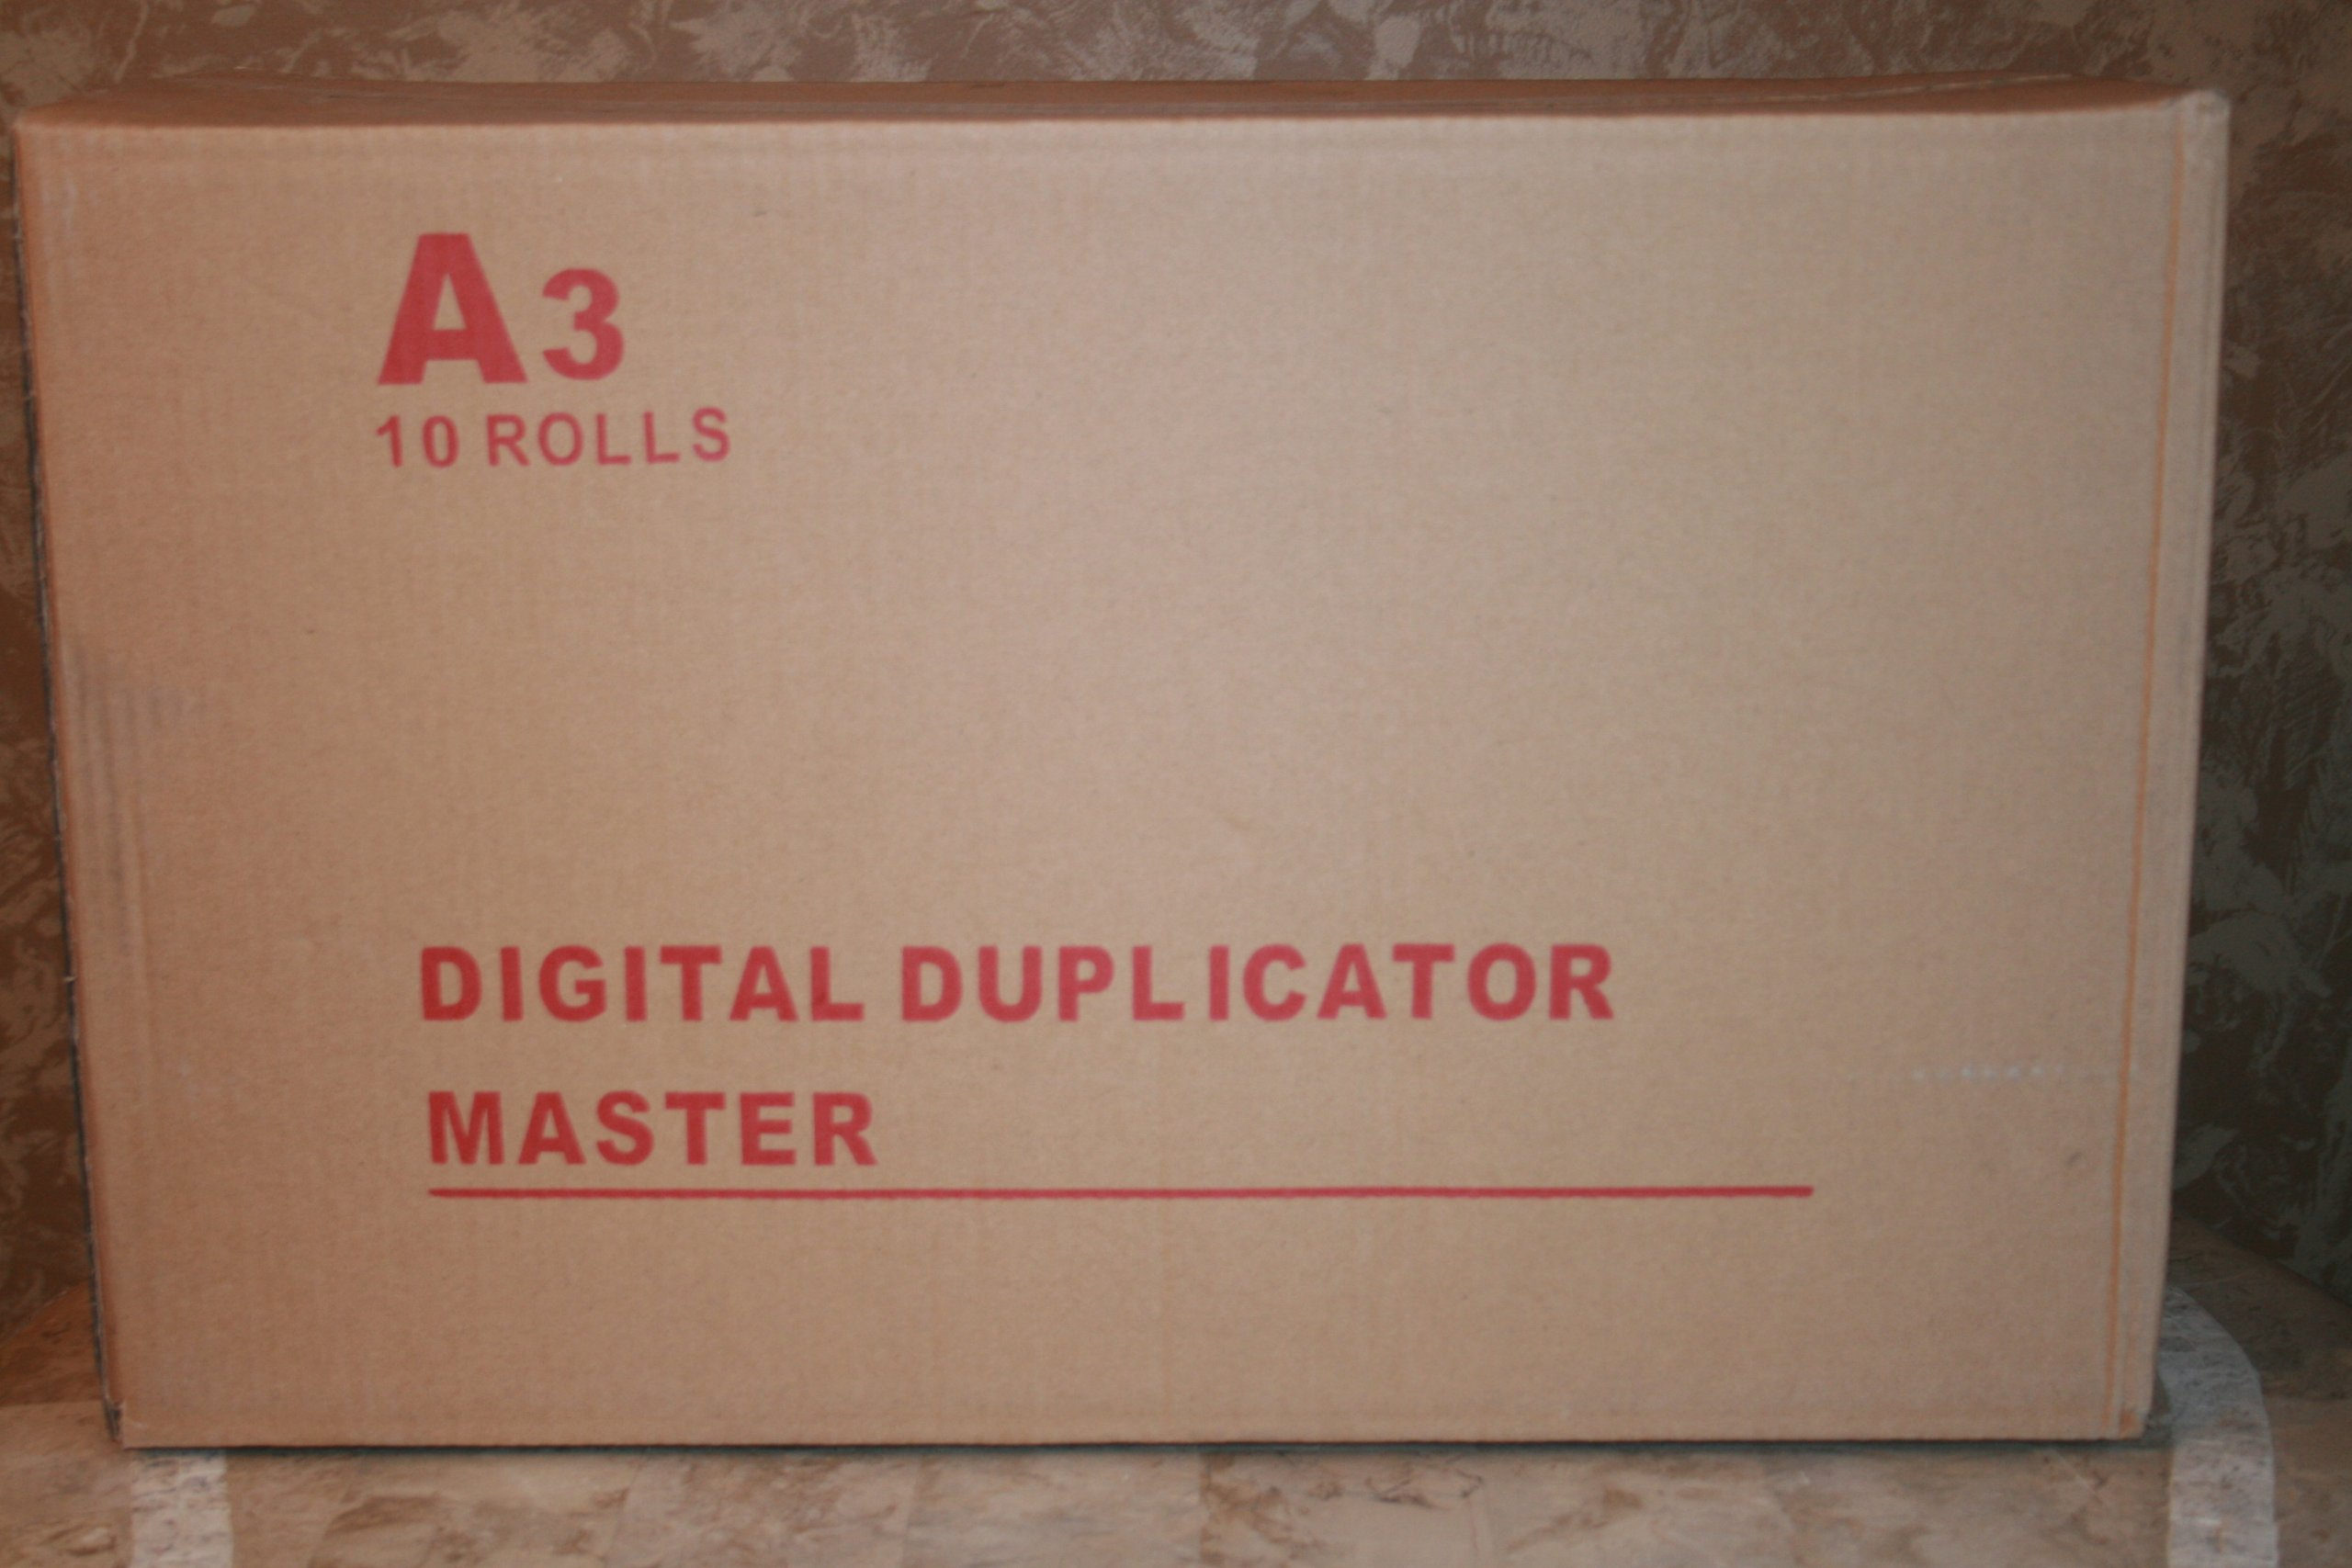 10 Ricoh JP-50, Part # 893015, Savin Part # 4555, Type 350, Gestetner CPMT13, Lanier LDD150, Standard Part # 3322 Compatible Master Rolls. by Ricoh / Savn / Gestetner Compatible (Image #2)